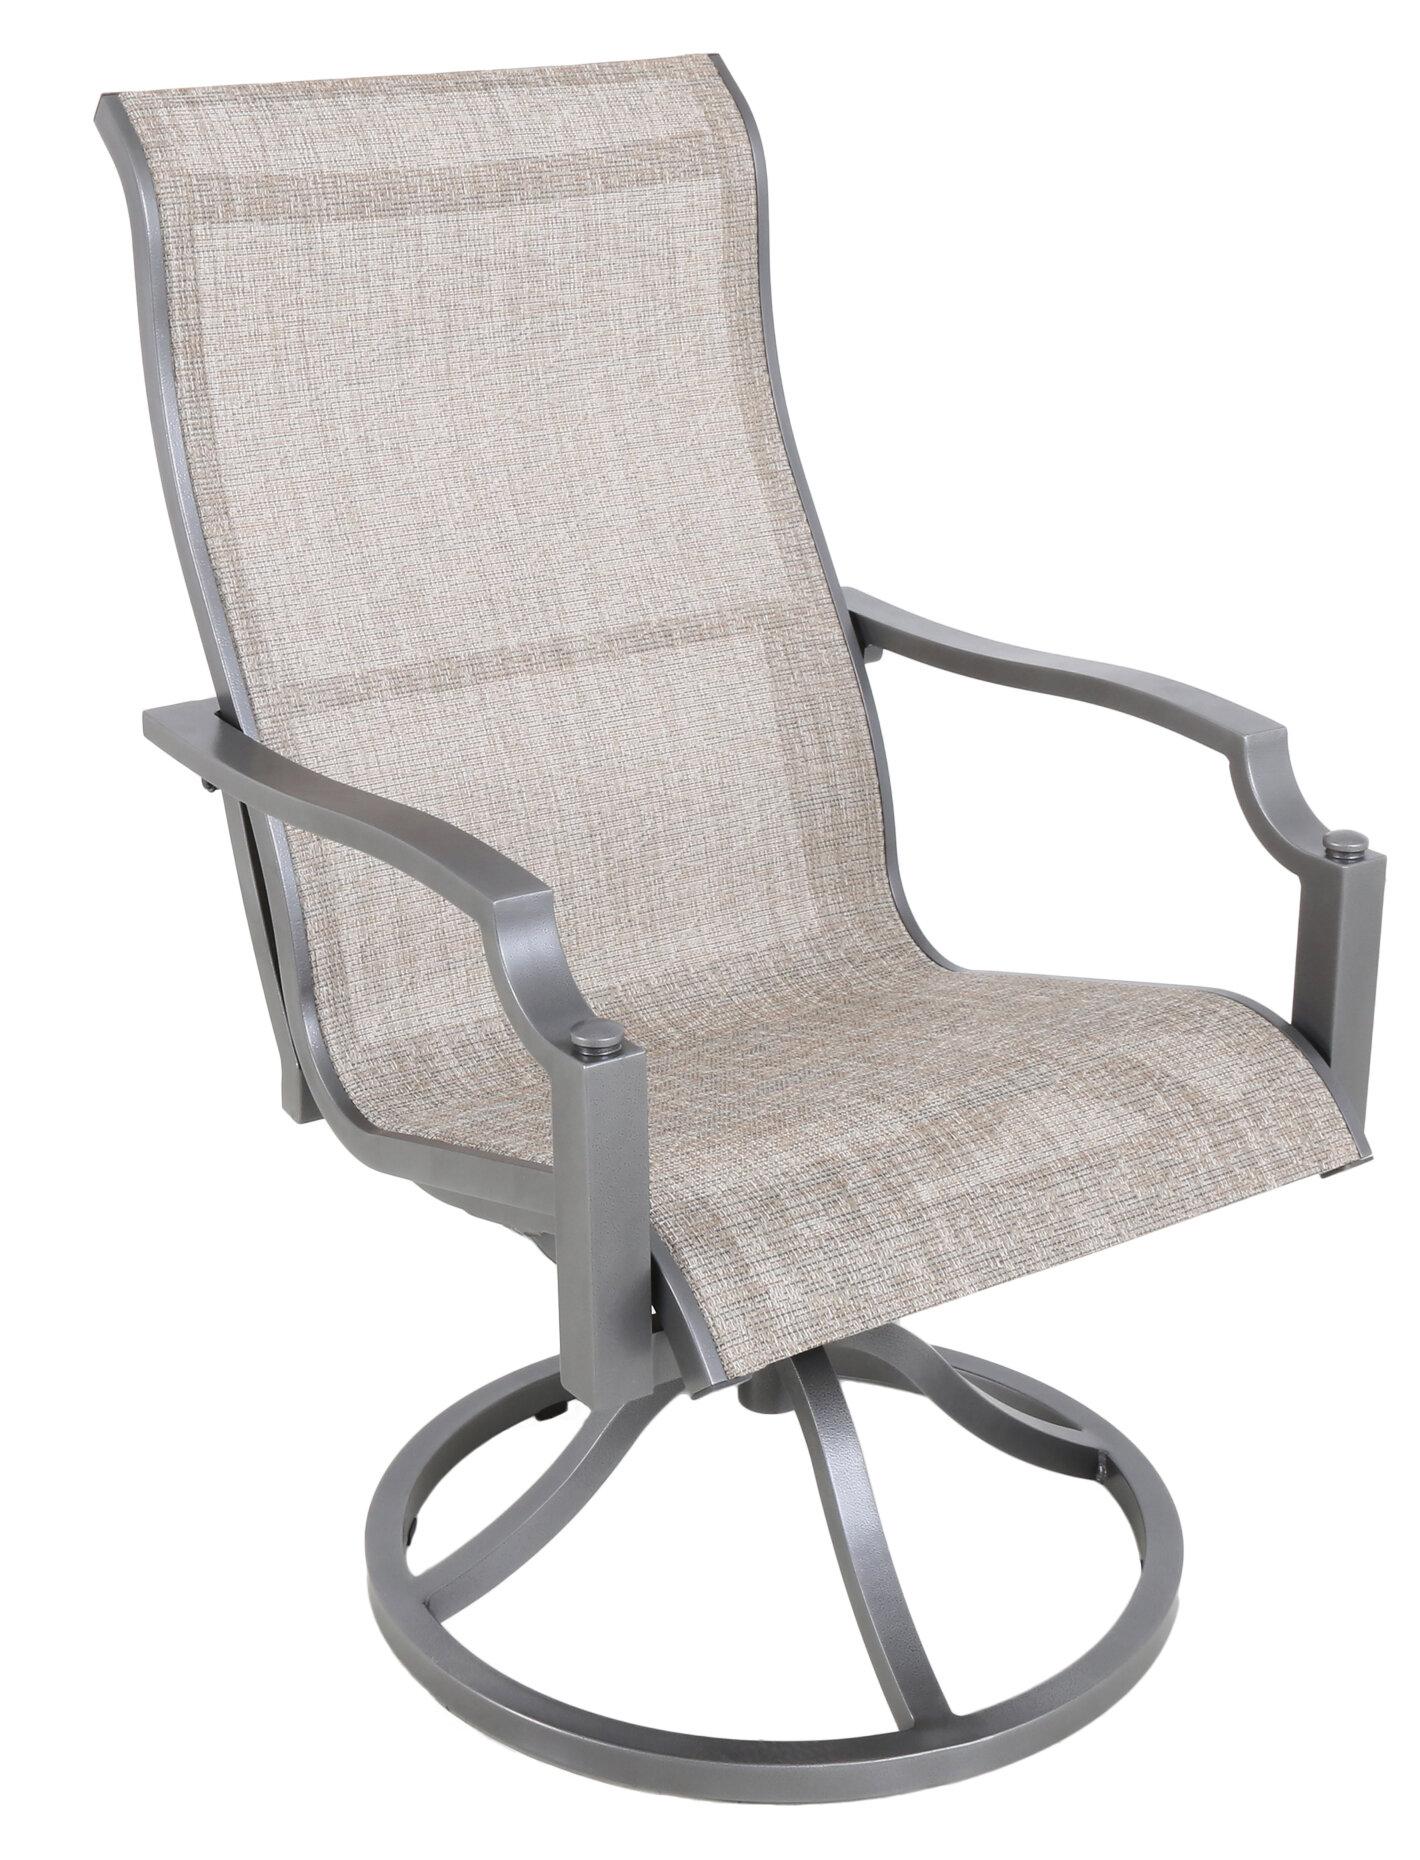 Sling Swivel Patio Dining Chair